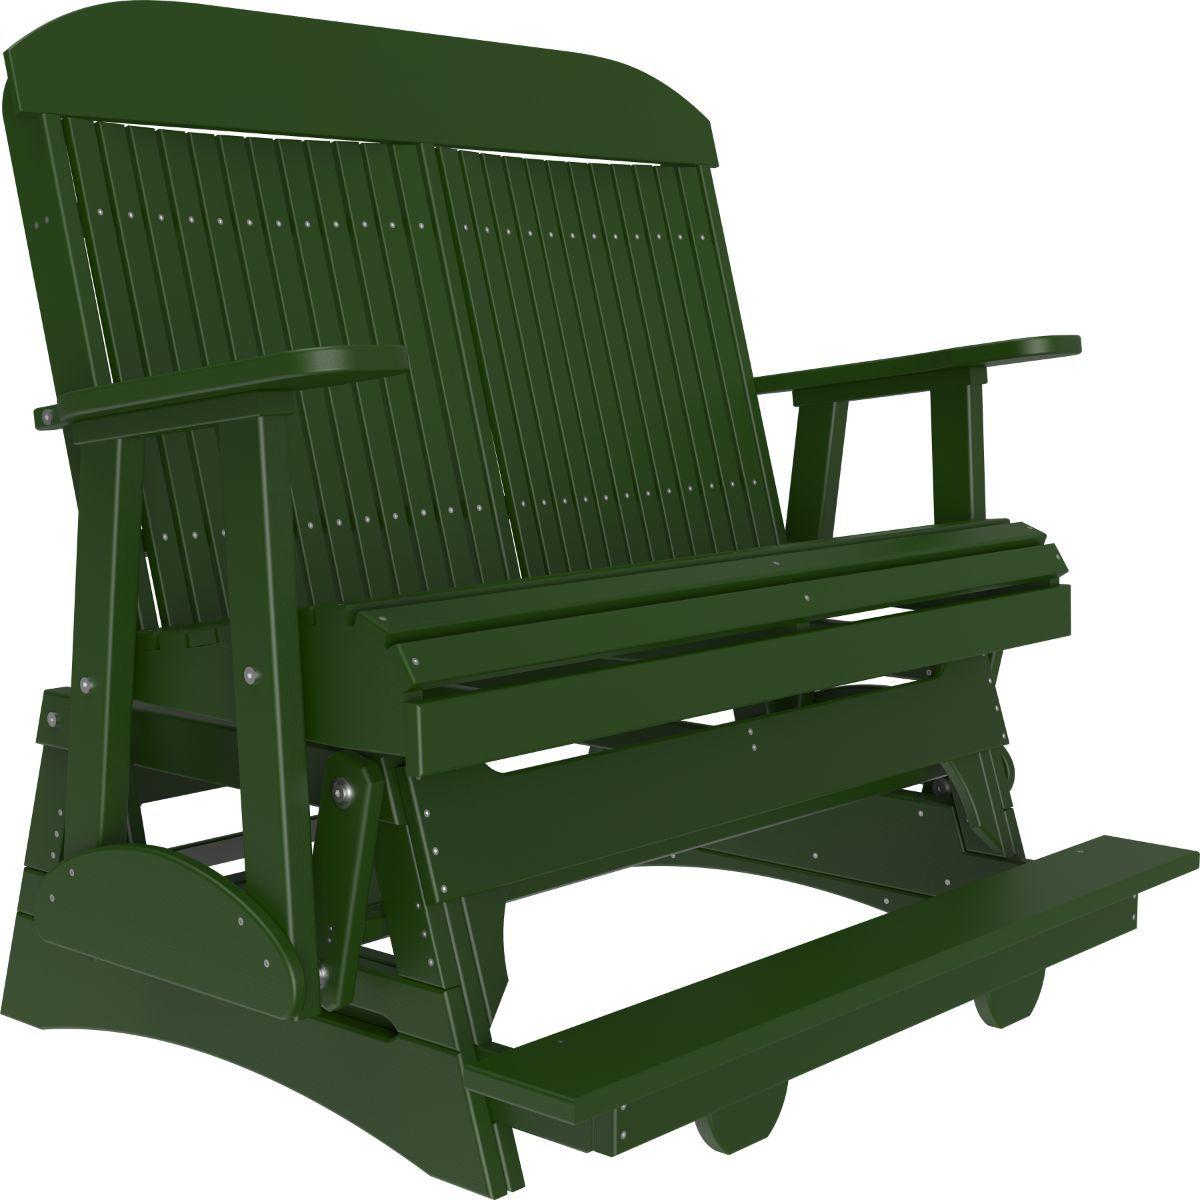 Green Stockton Loveseat Balcony Glider